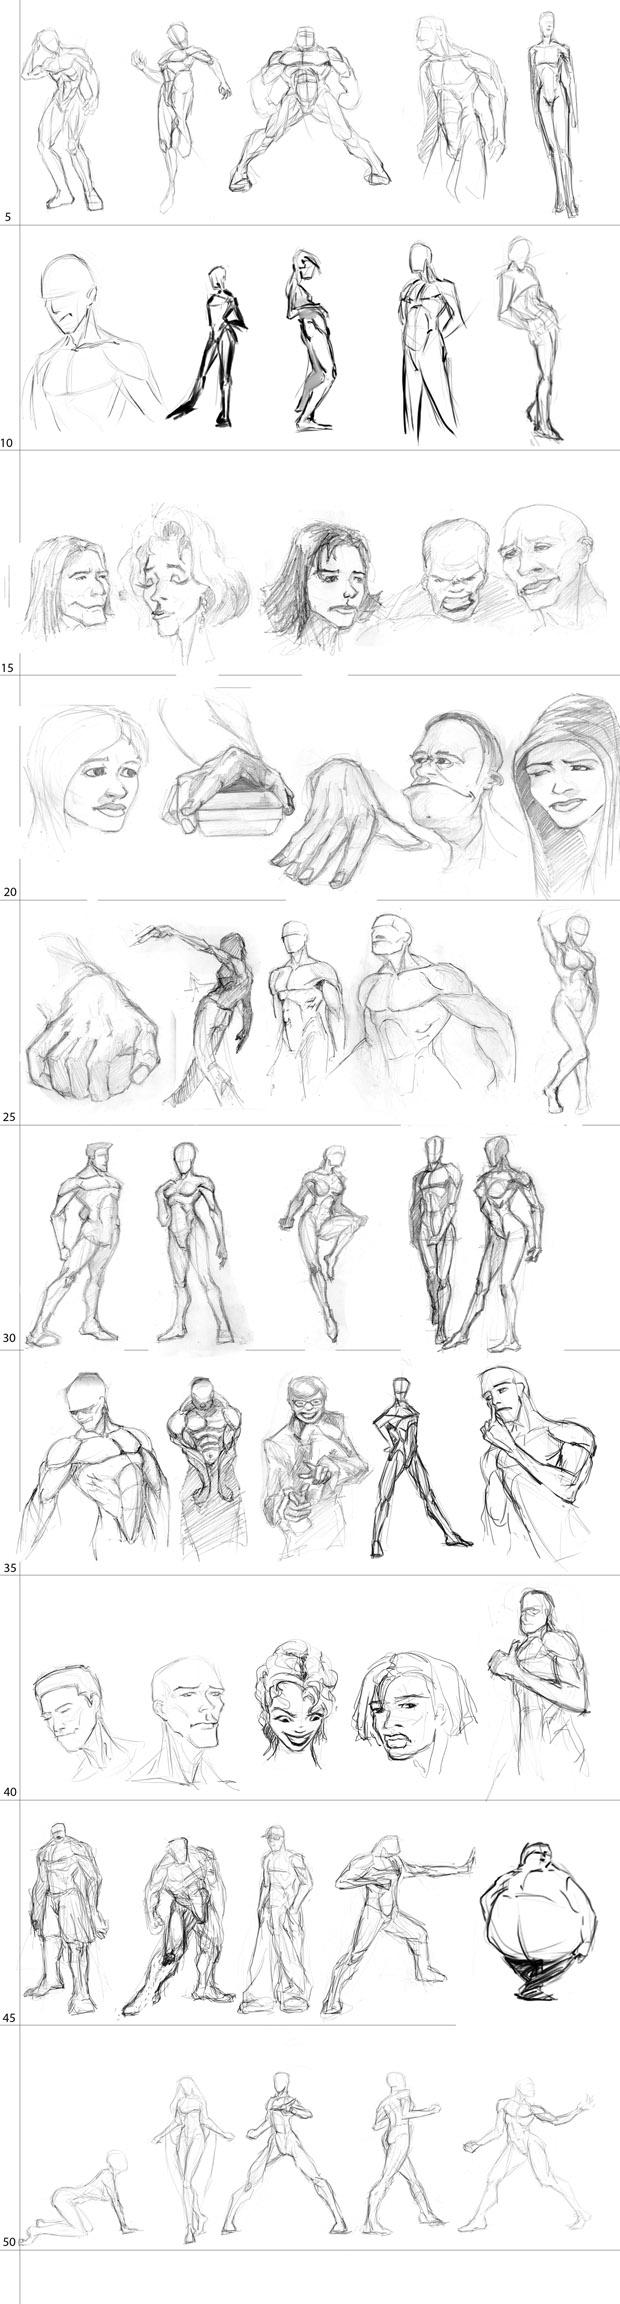 Spartan Camp #21 - 50 gestures + Optional Study of an action pose: Jump